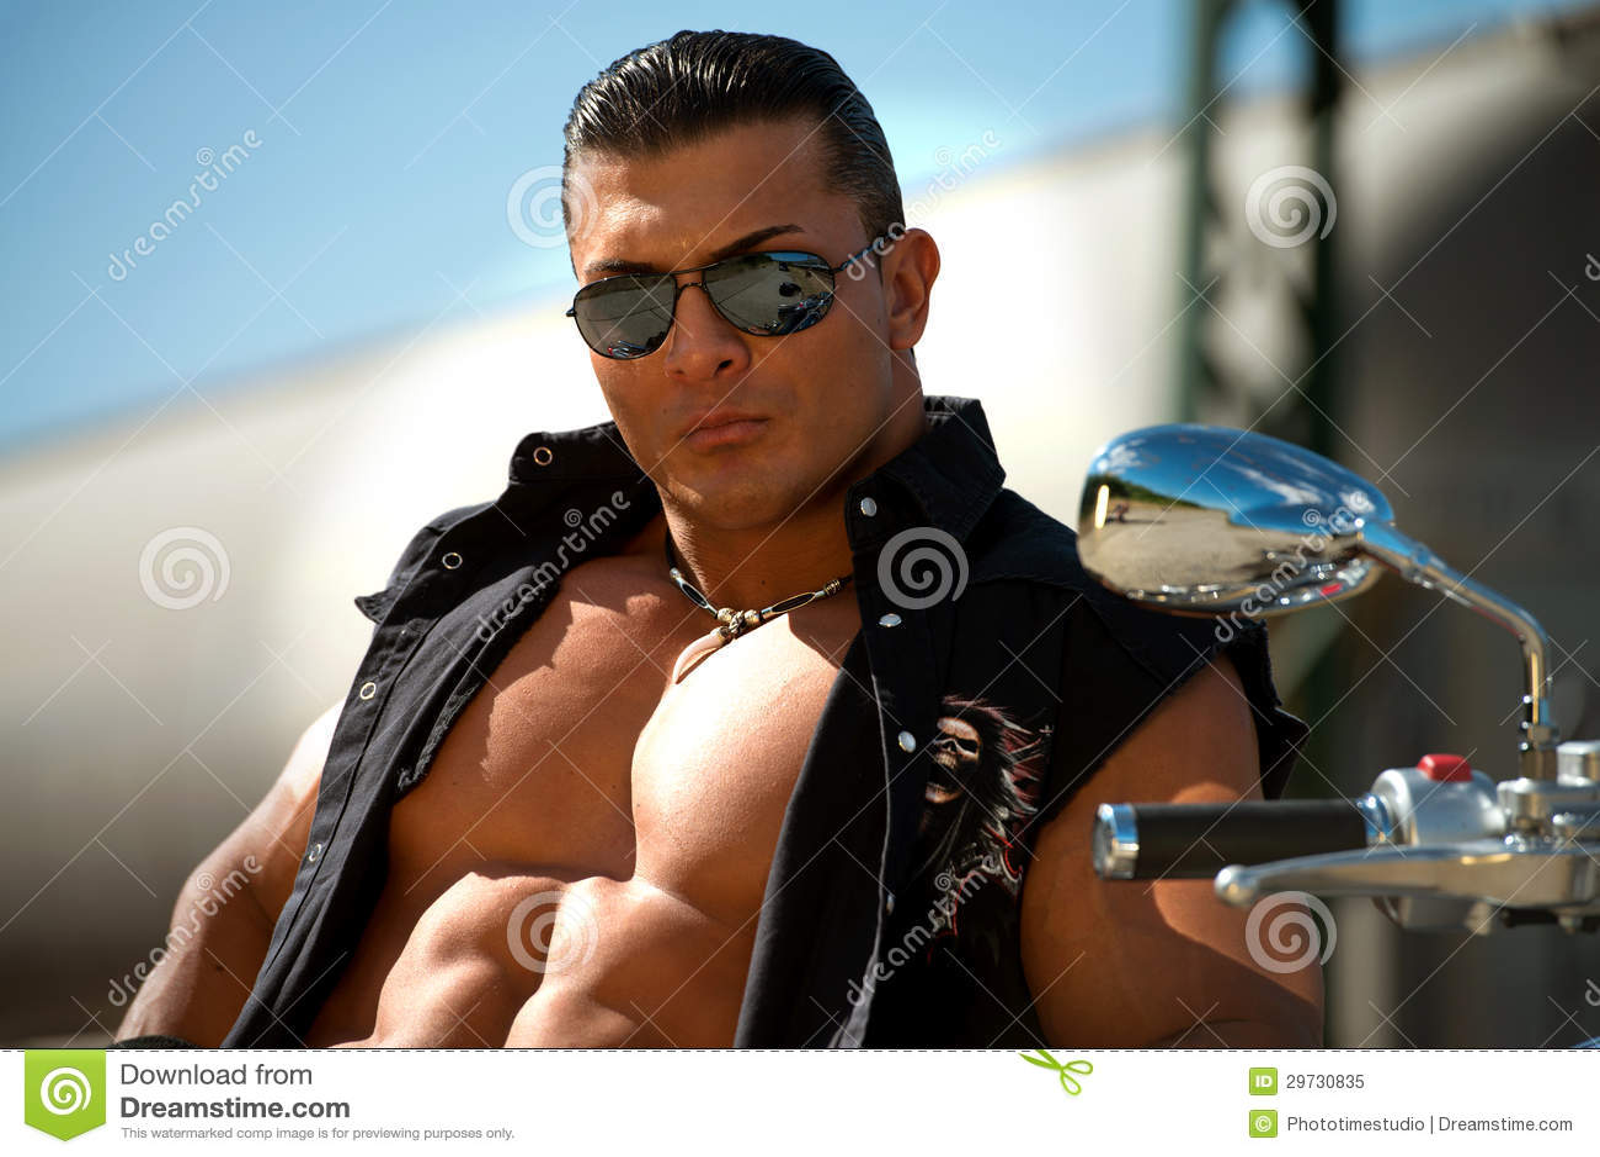 italian sunglasses xgqo  italian sunglasses